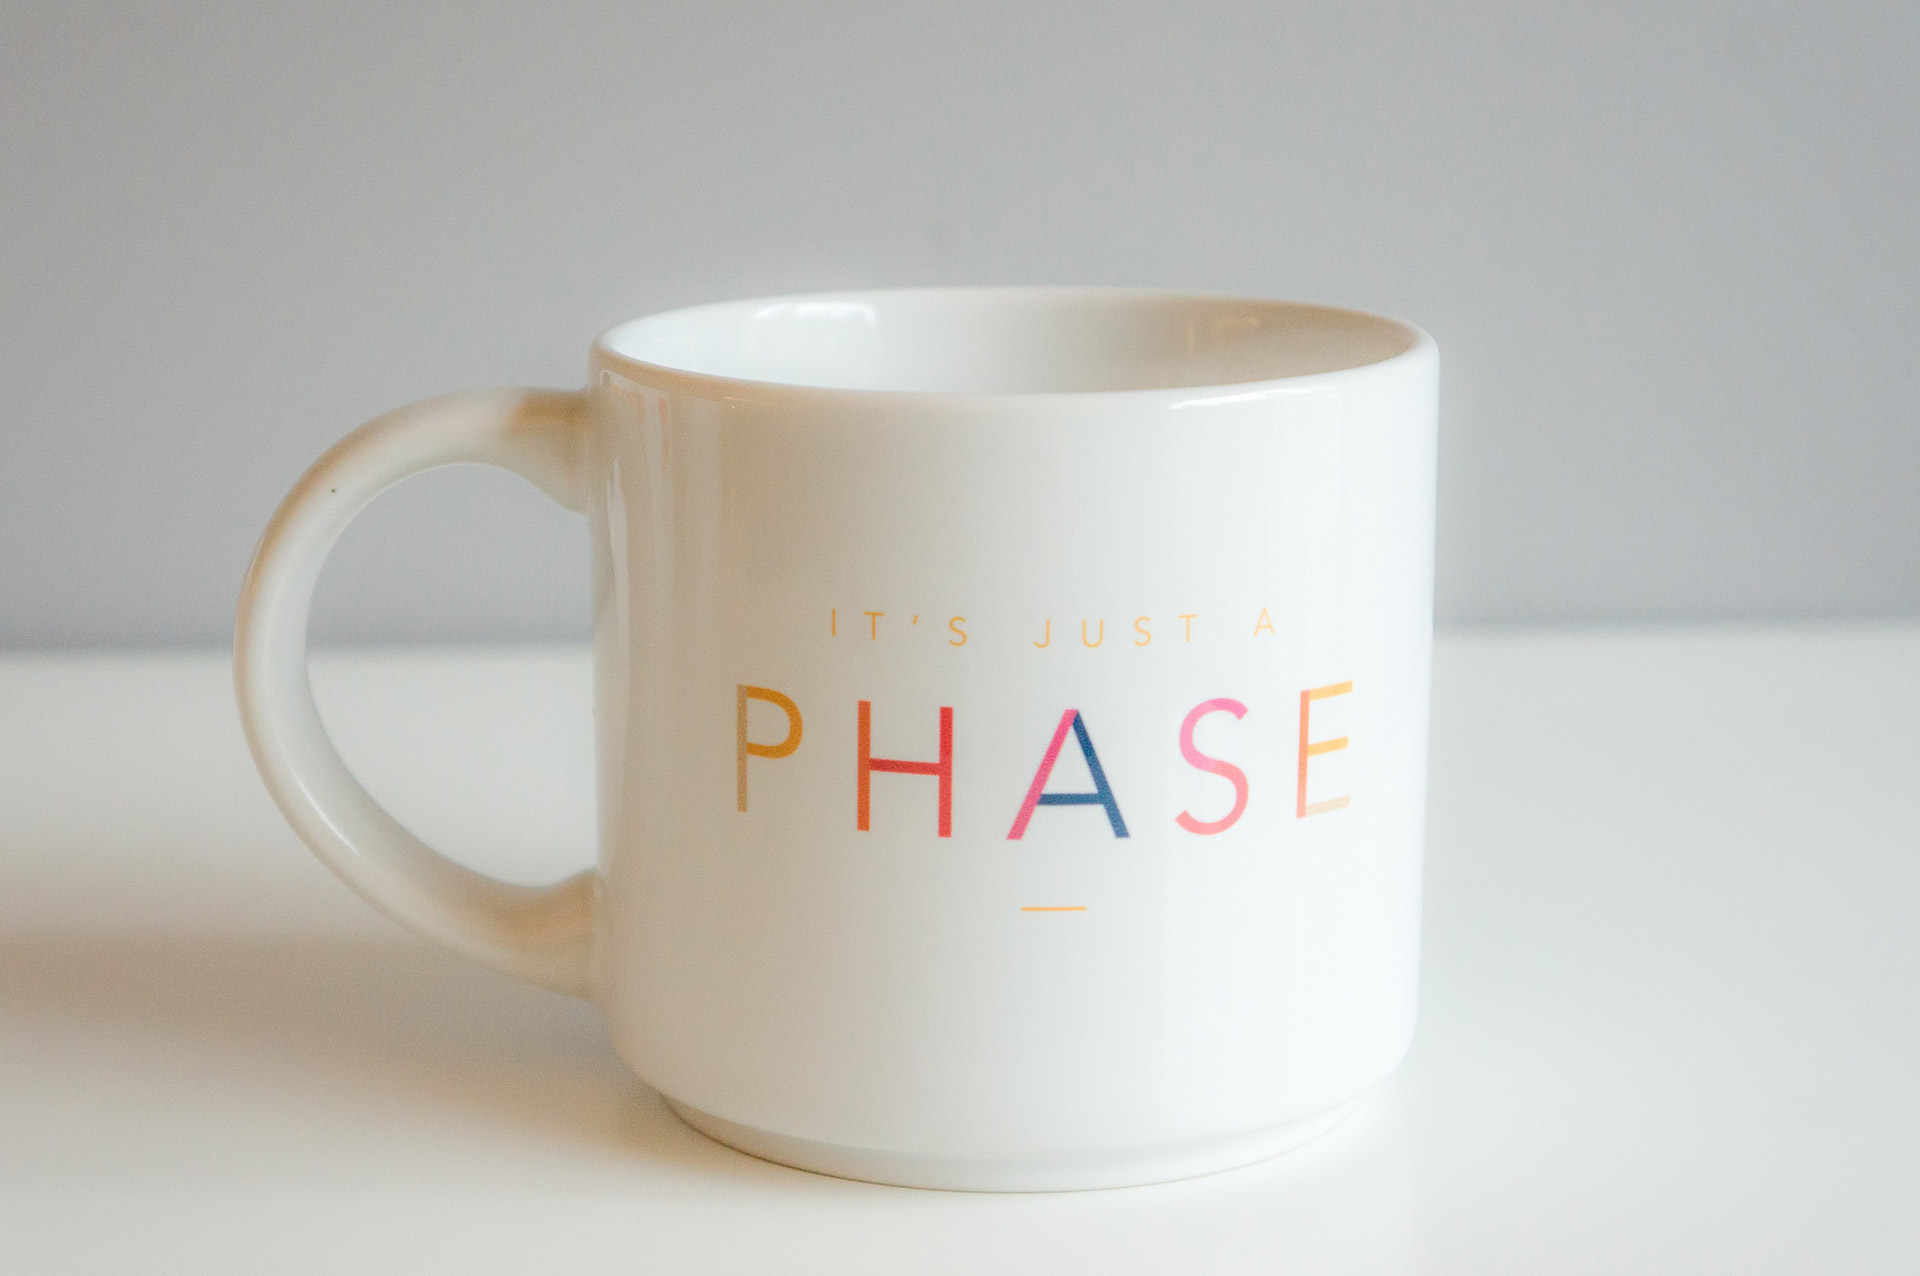 orangeconference-2015-mug.jpg